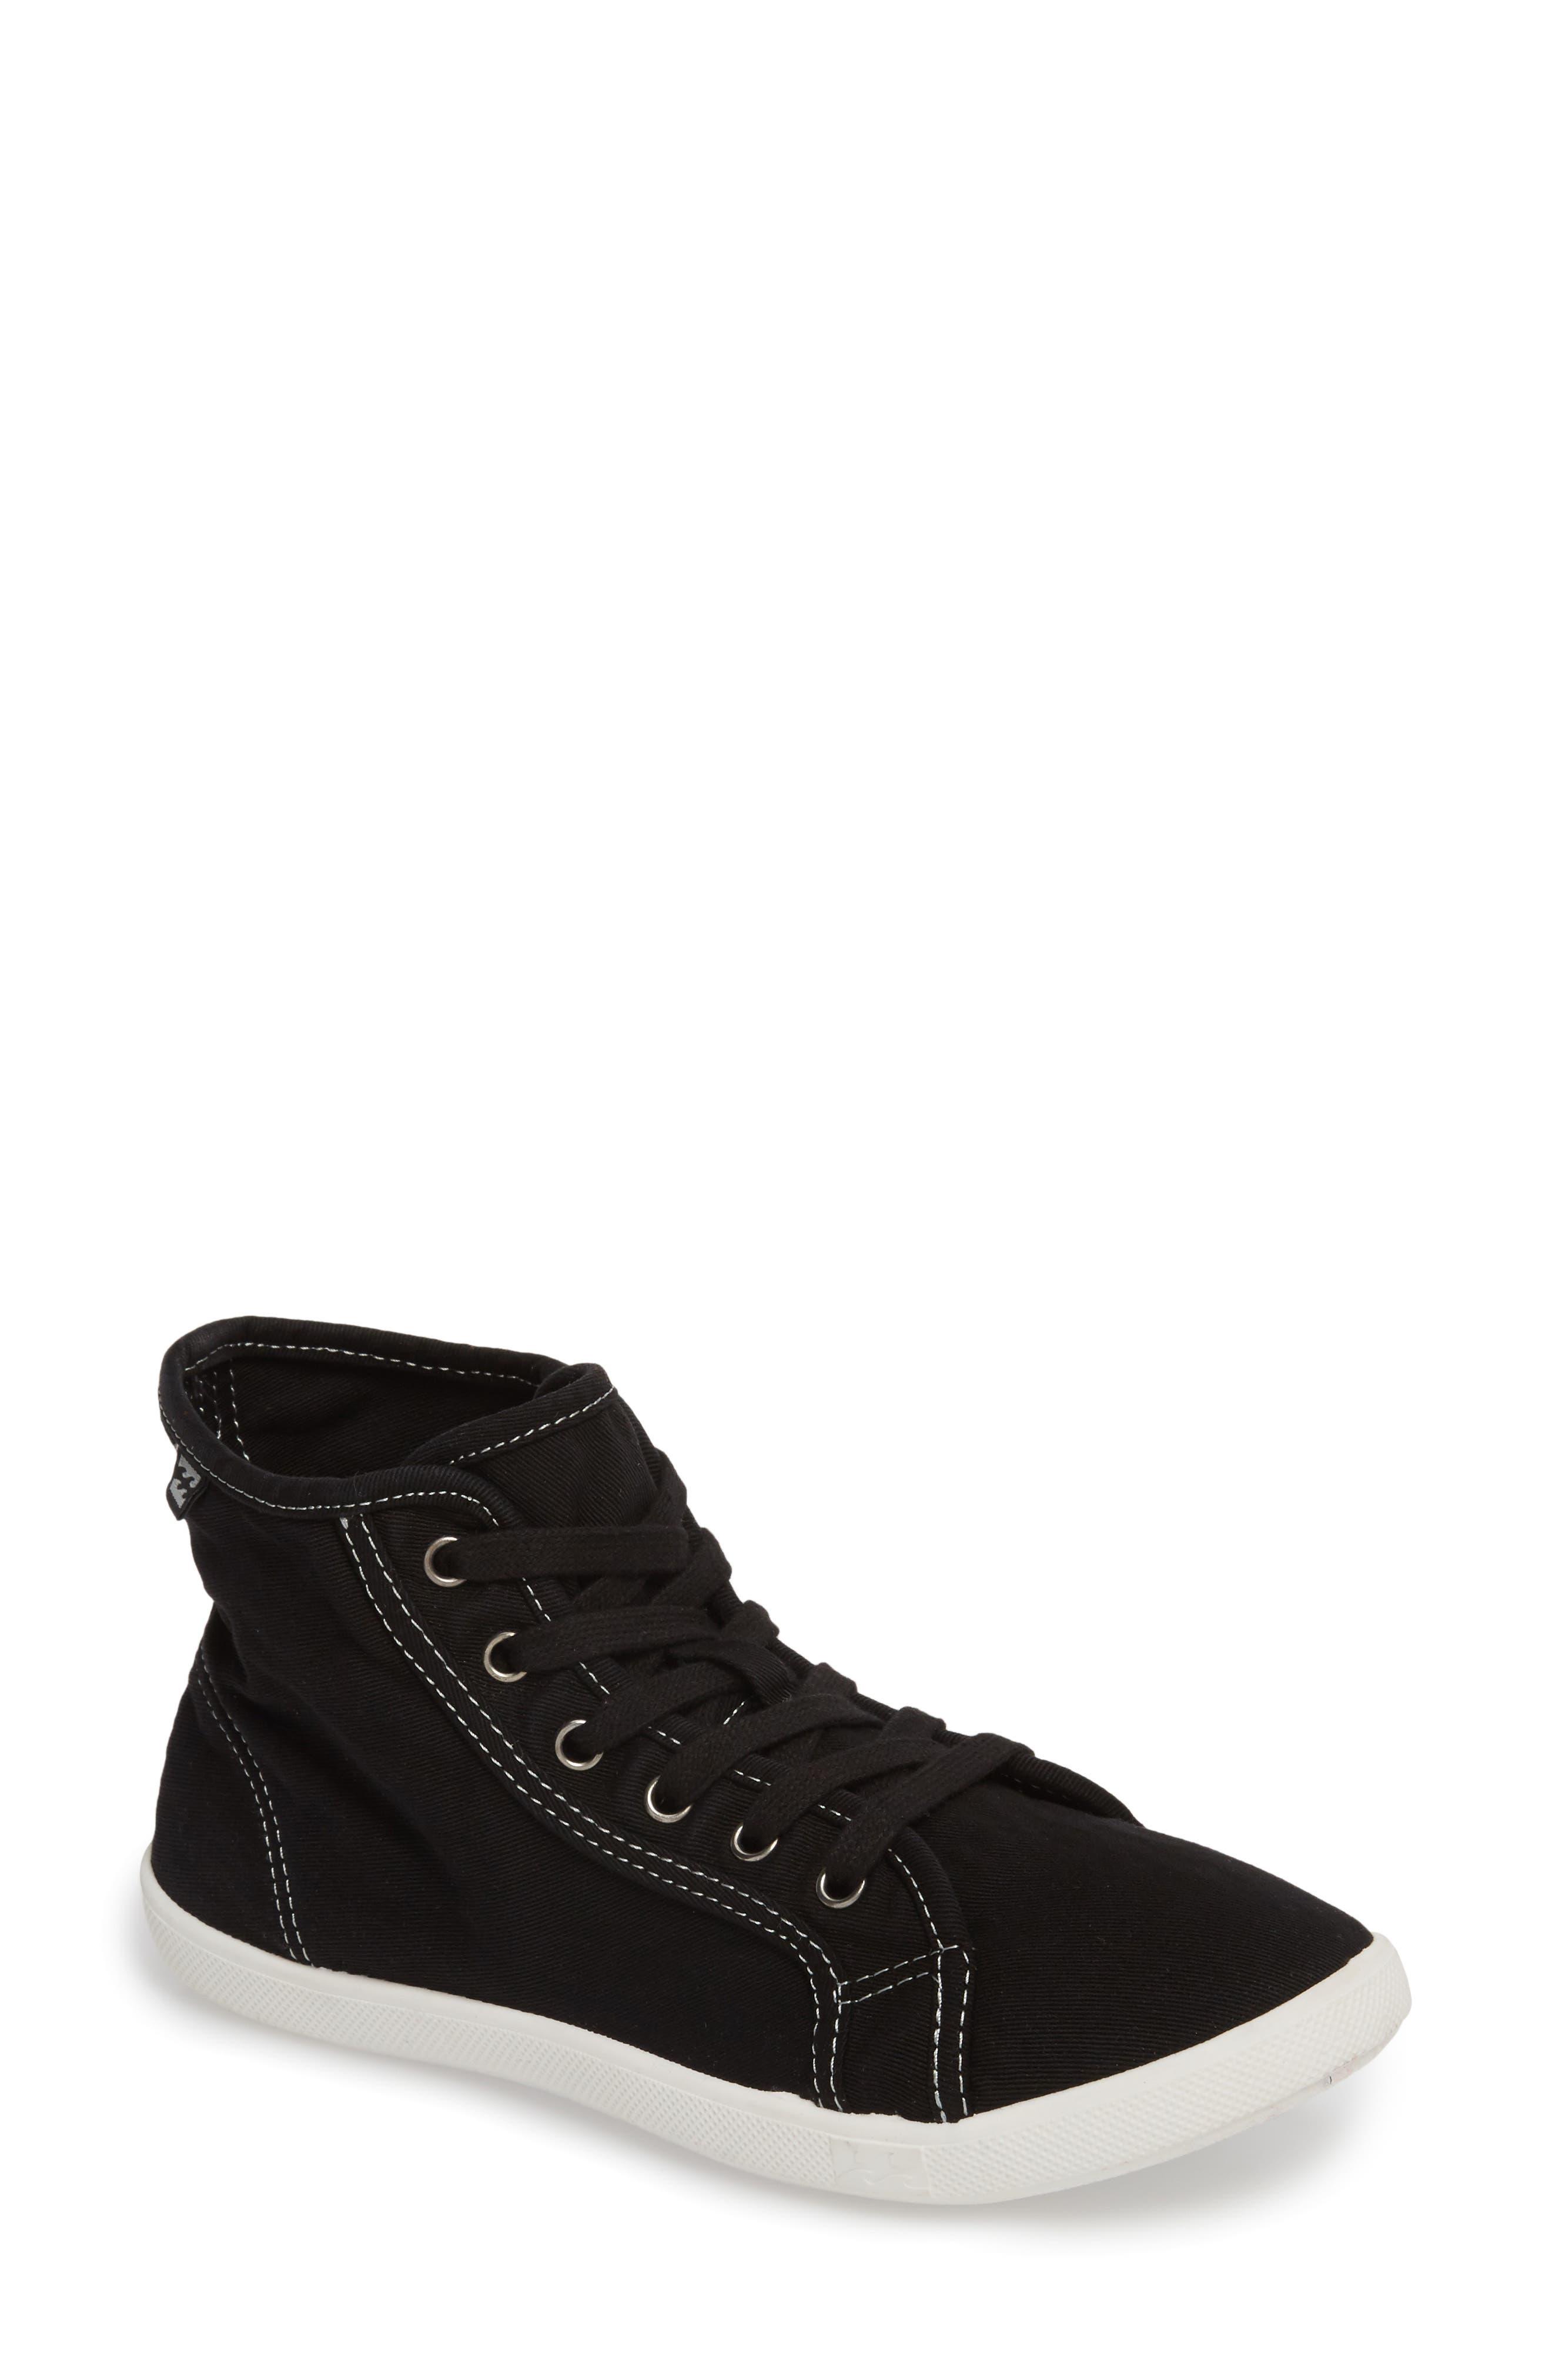 Phoenix Sneaker,                             Main thumbnail 2, color,